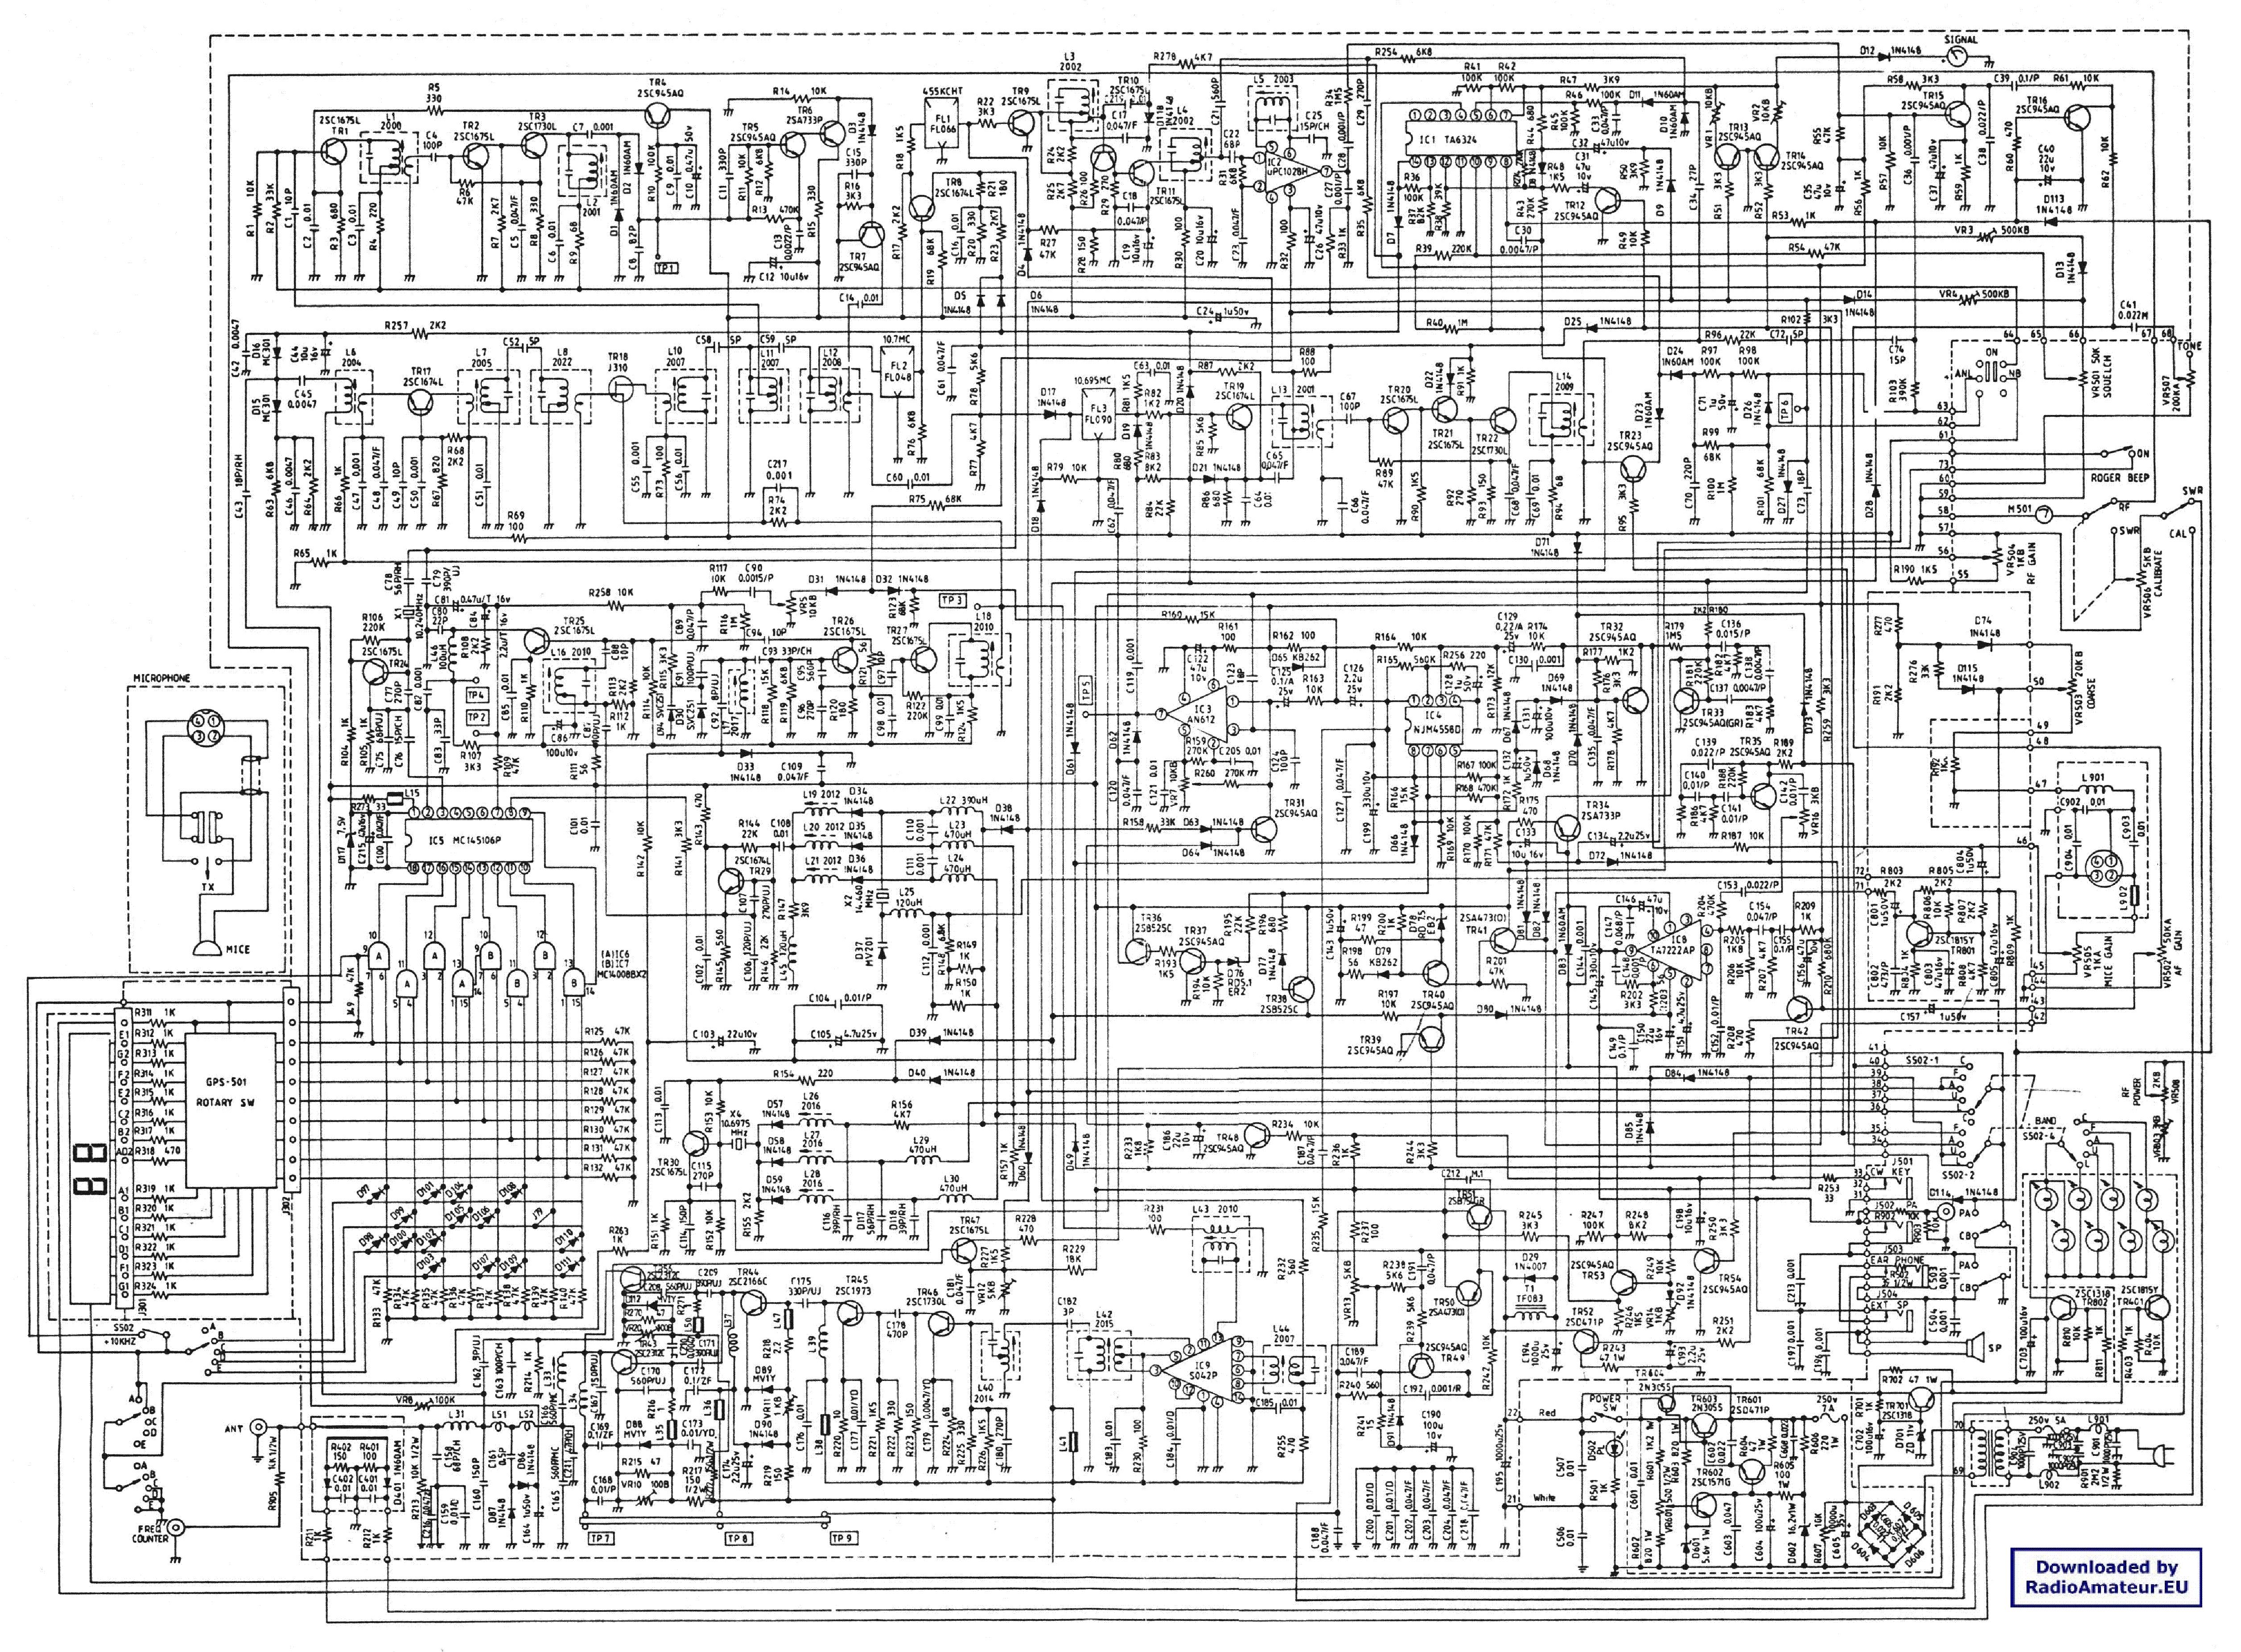 GALAXY CB Service Manual download, schematics, eeprom, repair info